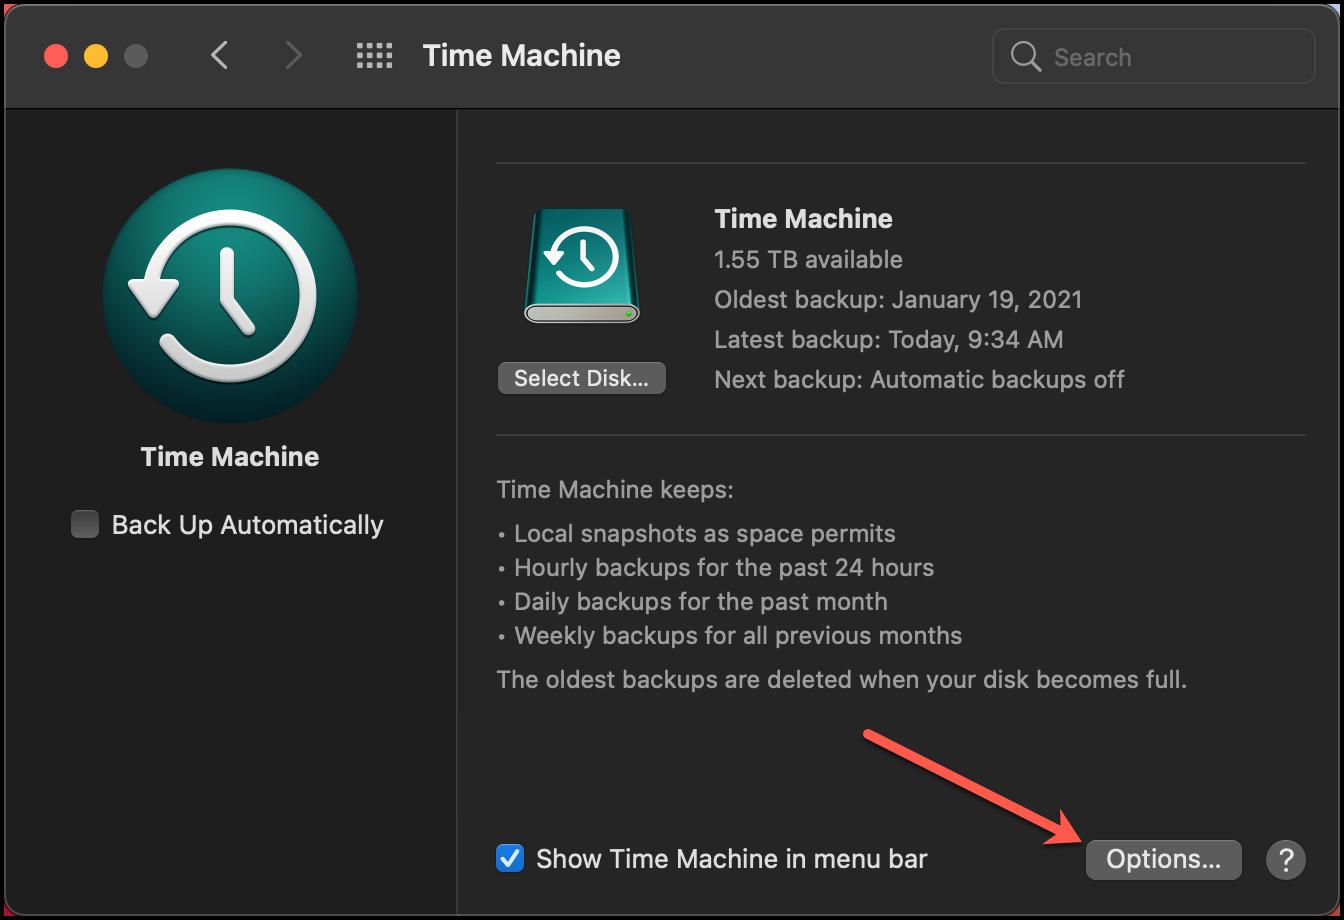 Time Machine Options